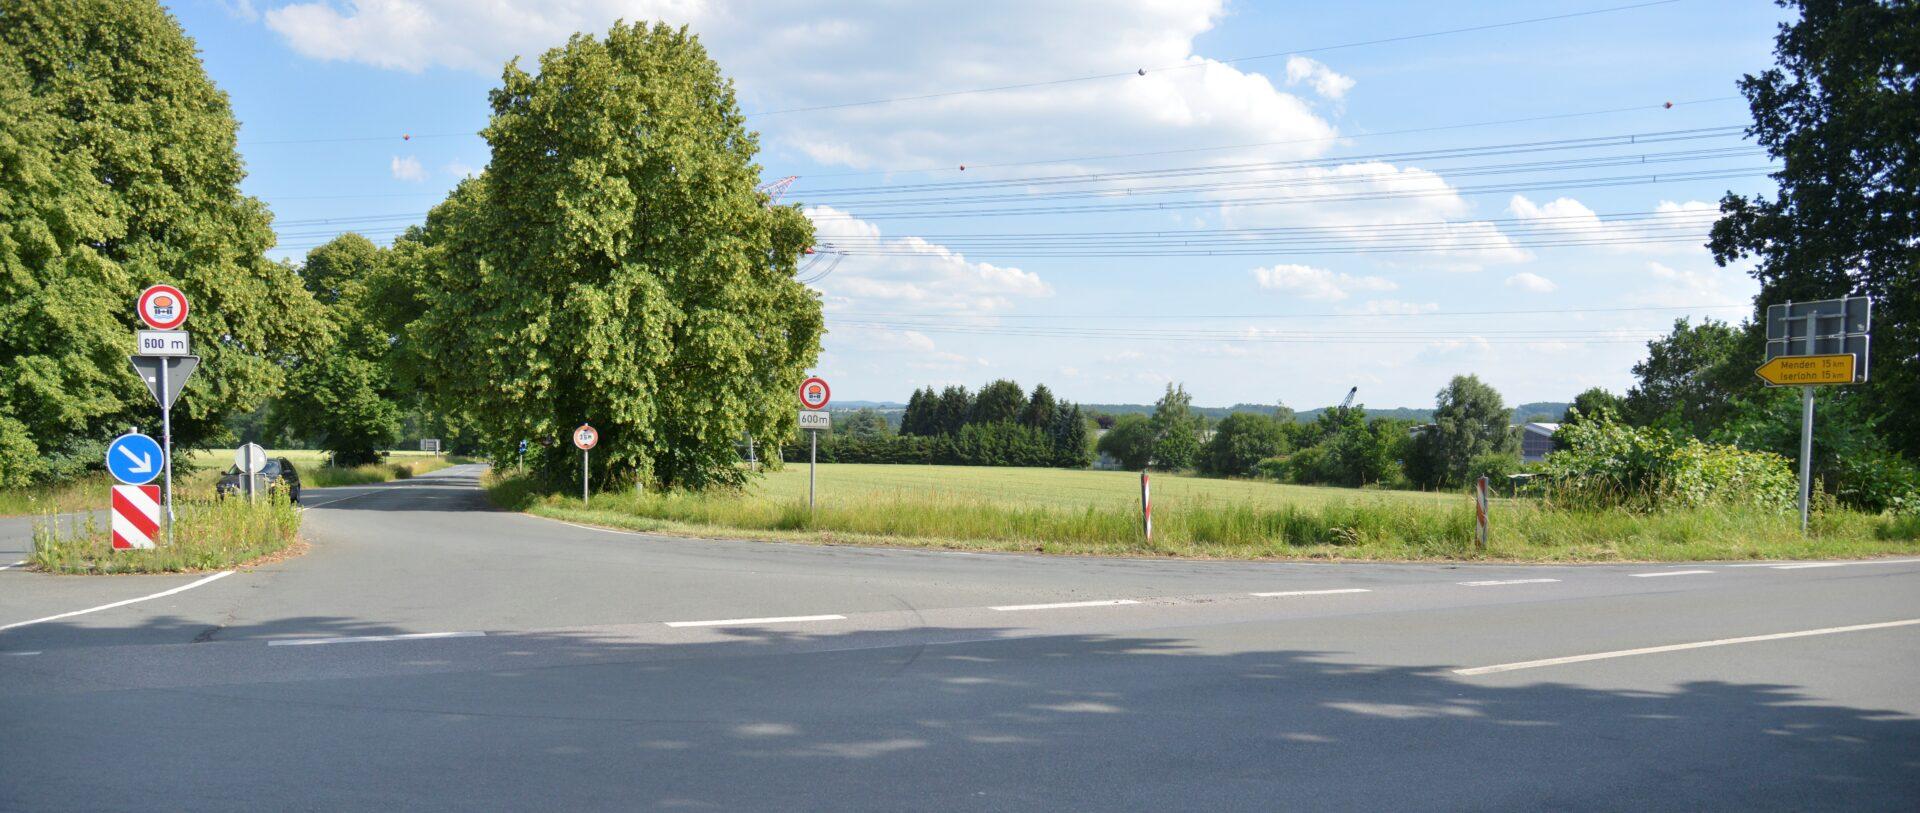 Langsamer fahren: Bereich Unnaer Straße / Zum Wellenbad wird entschärft